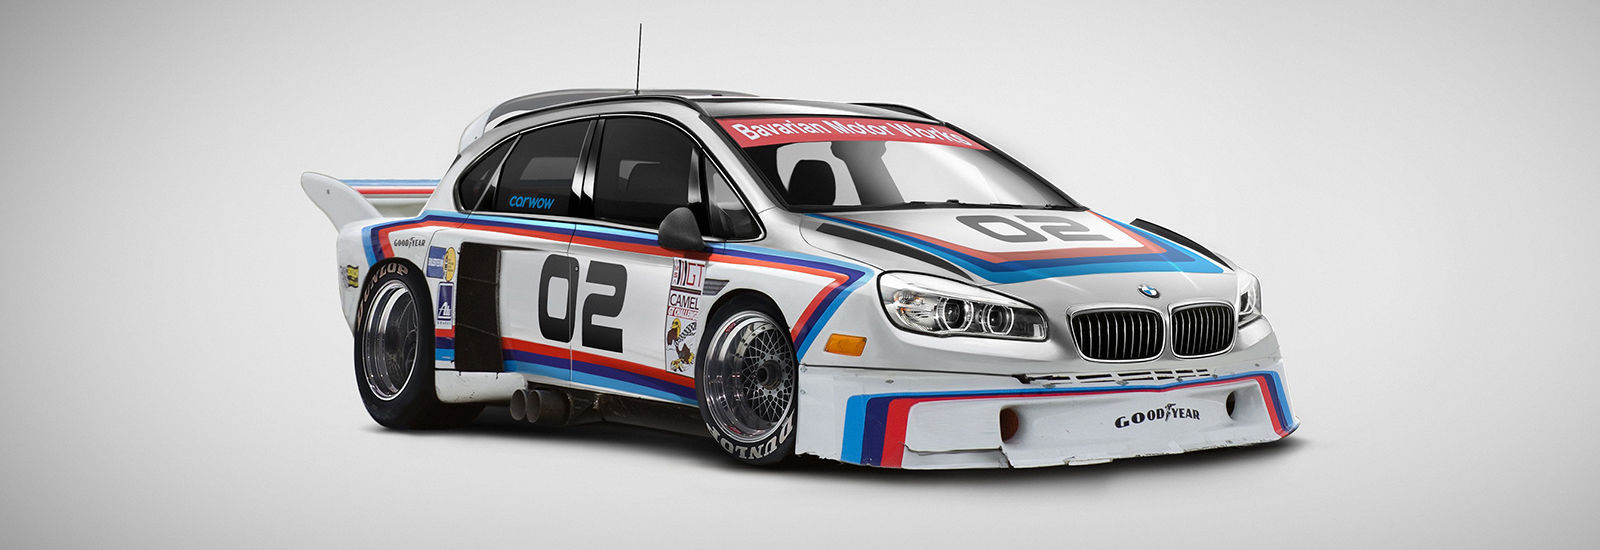 G-carwow-BMW-2-Series-CSL-Batmobile-Active-Tourer-cropped